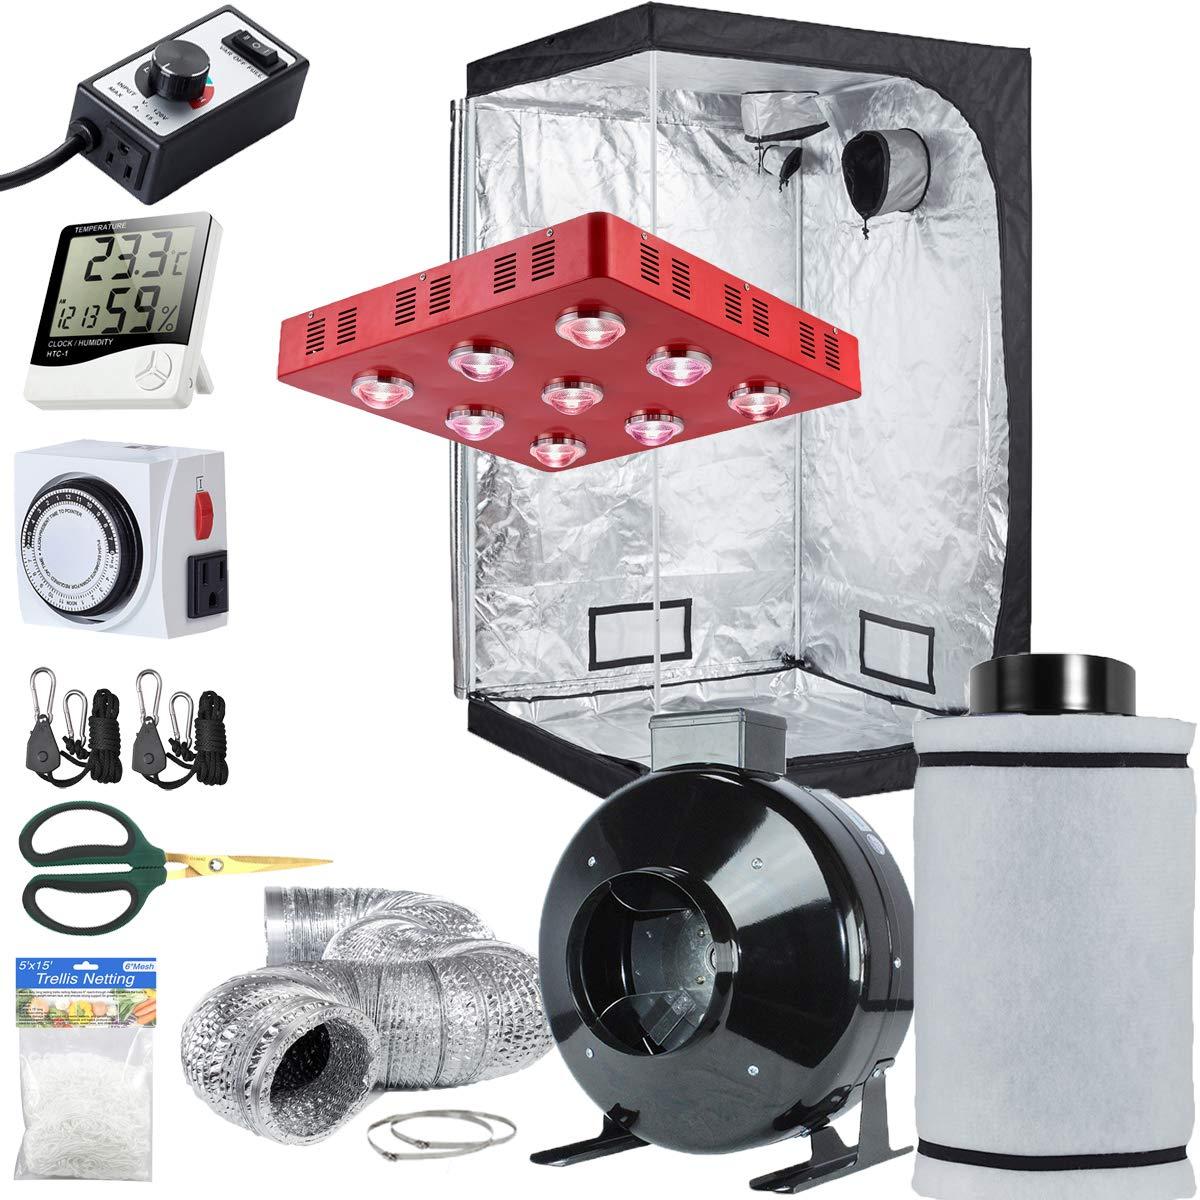 TopoLite Grow Tent Setup Complete Kit LED 1800W Grow Light + 6'' Filter Fan Kit + 48''x48''x80'' Dark Room + Hydroponics Indoor Plants Growing System Accessories (48''x48''x80'')